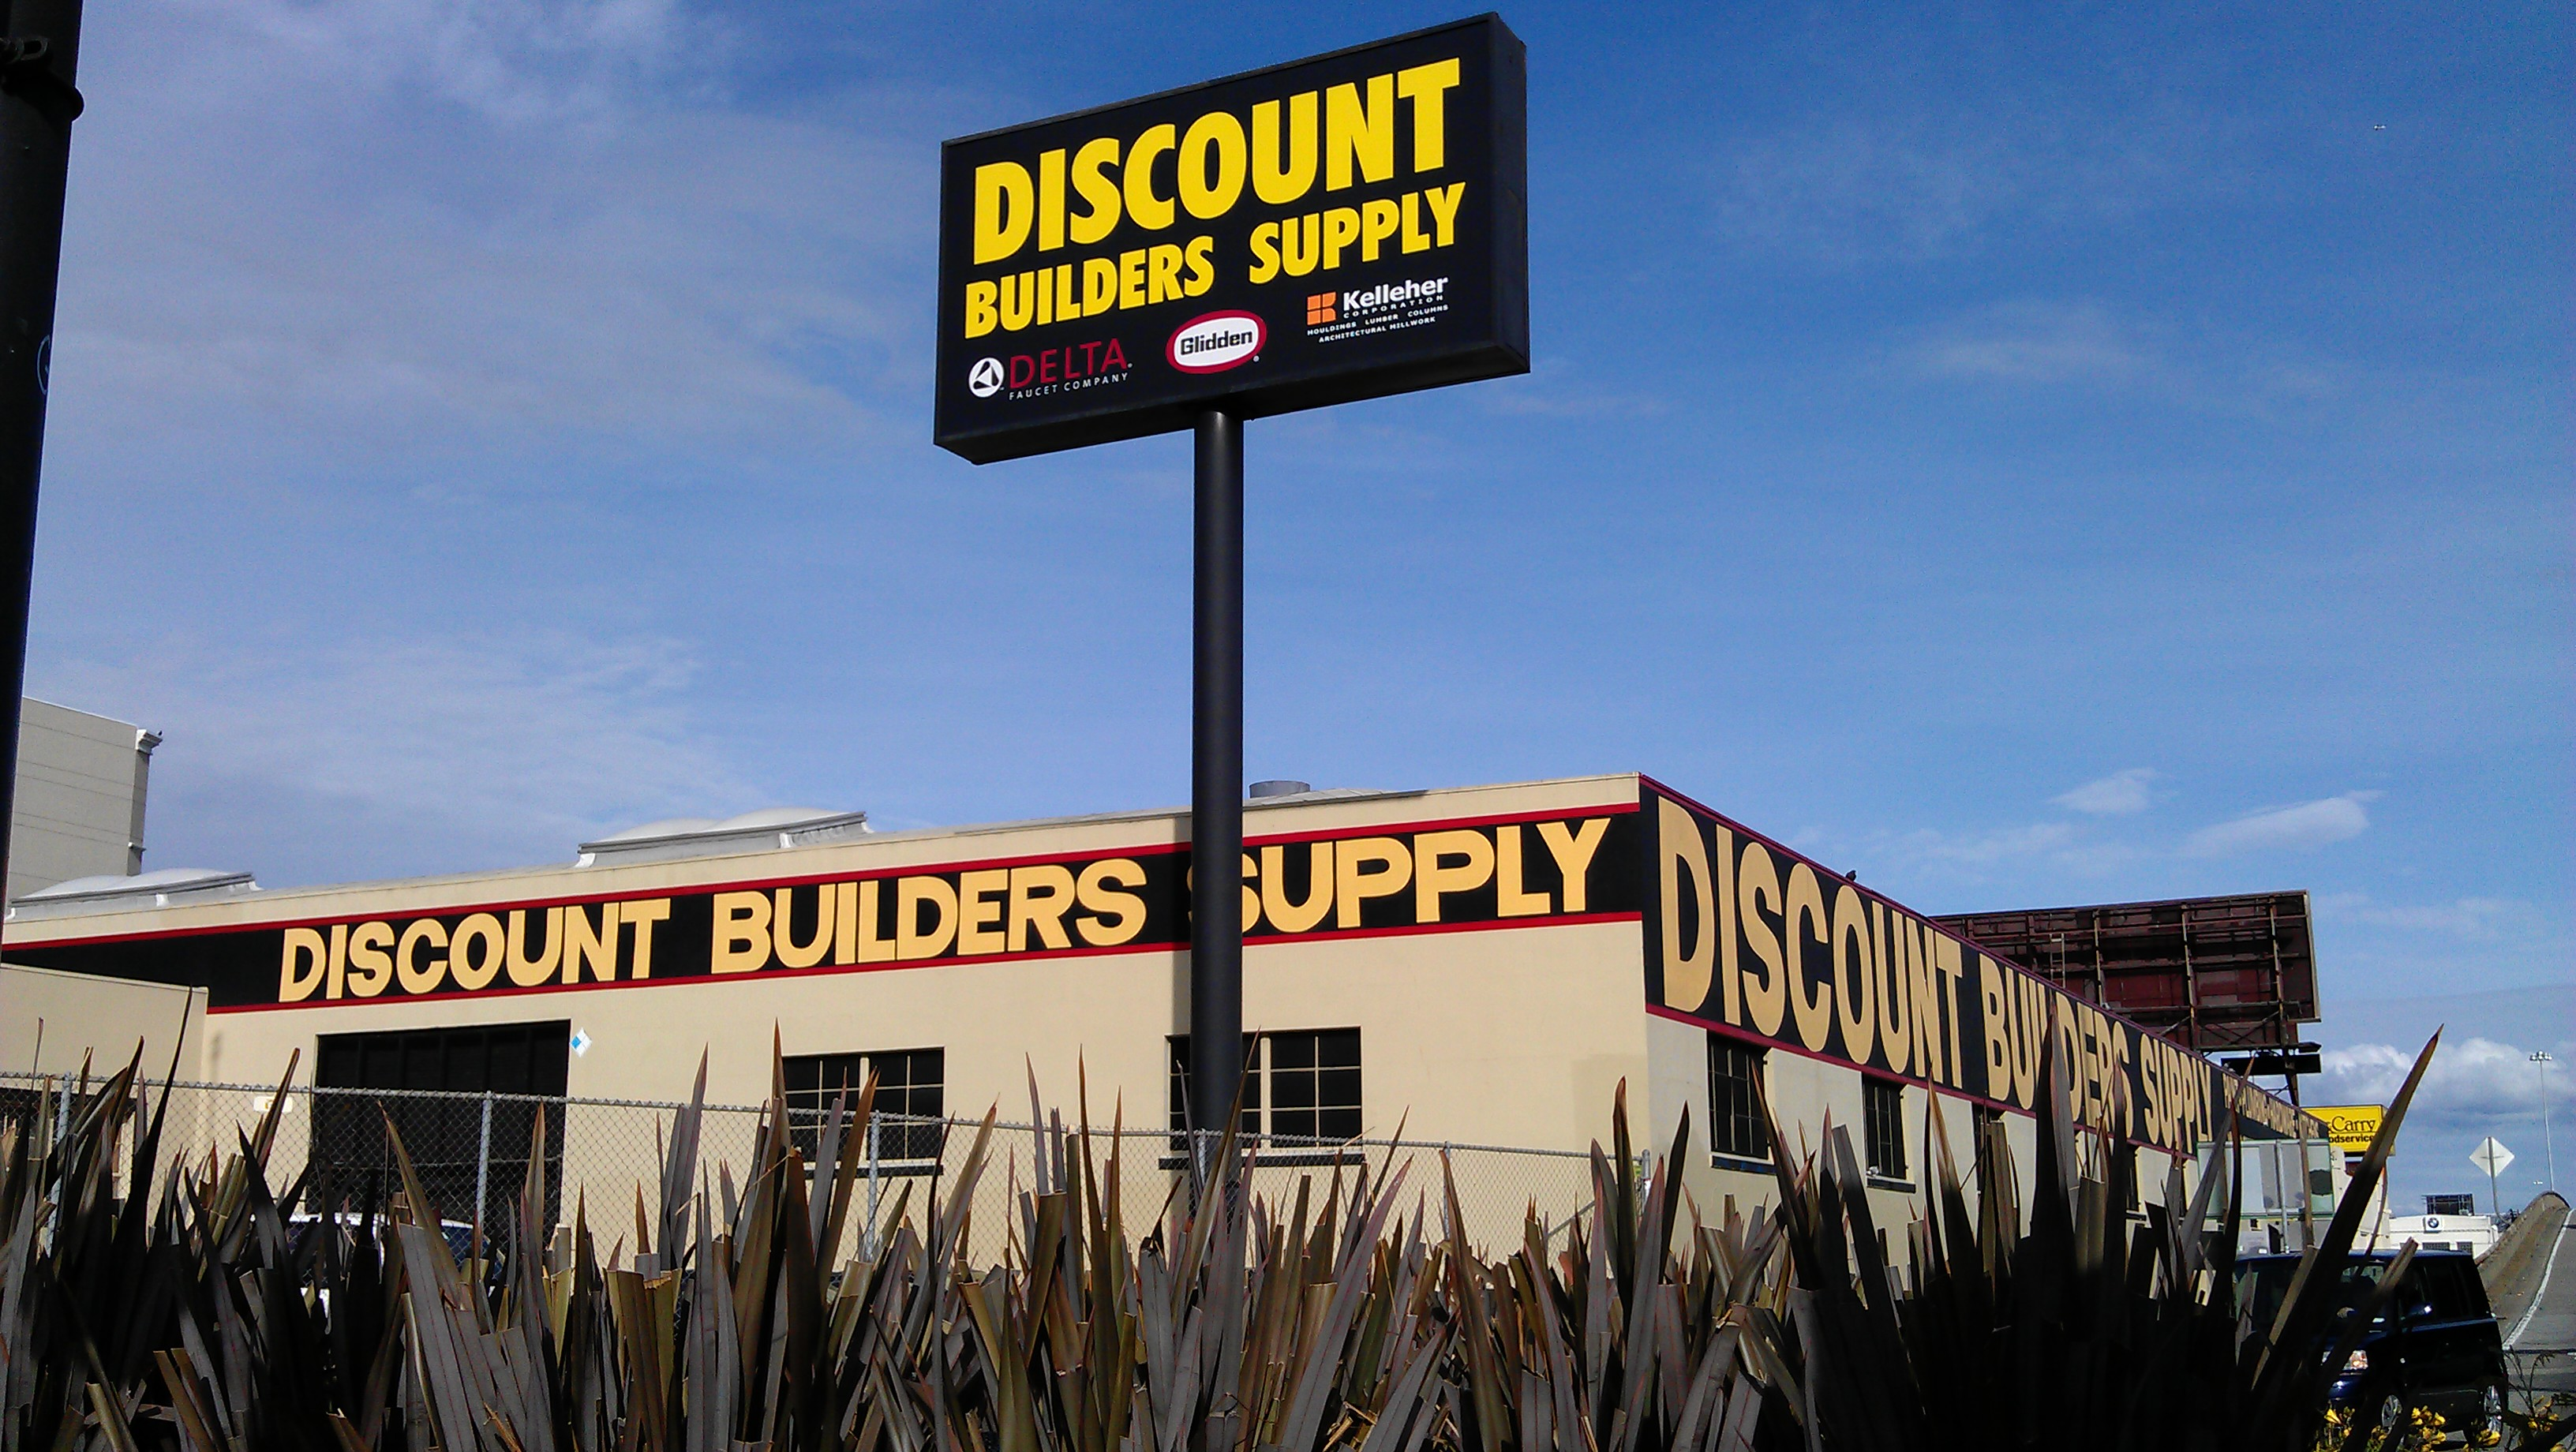 Discount Builders Supply